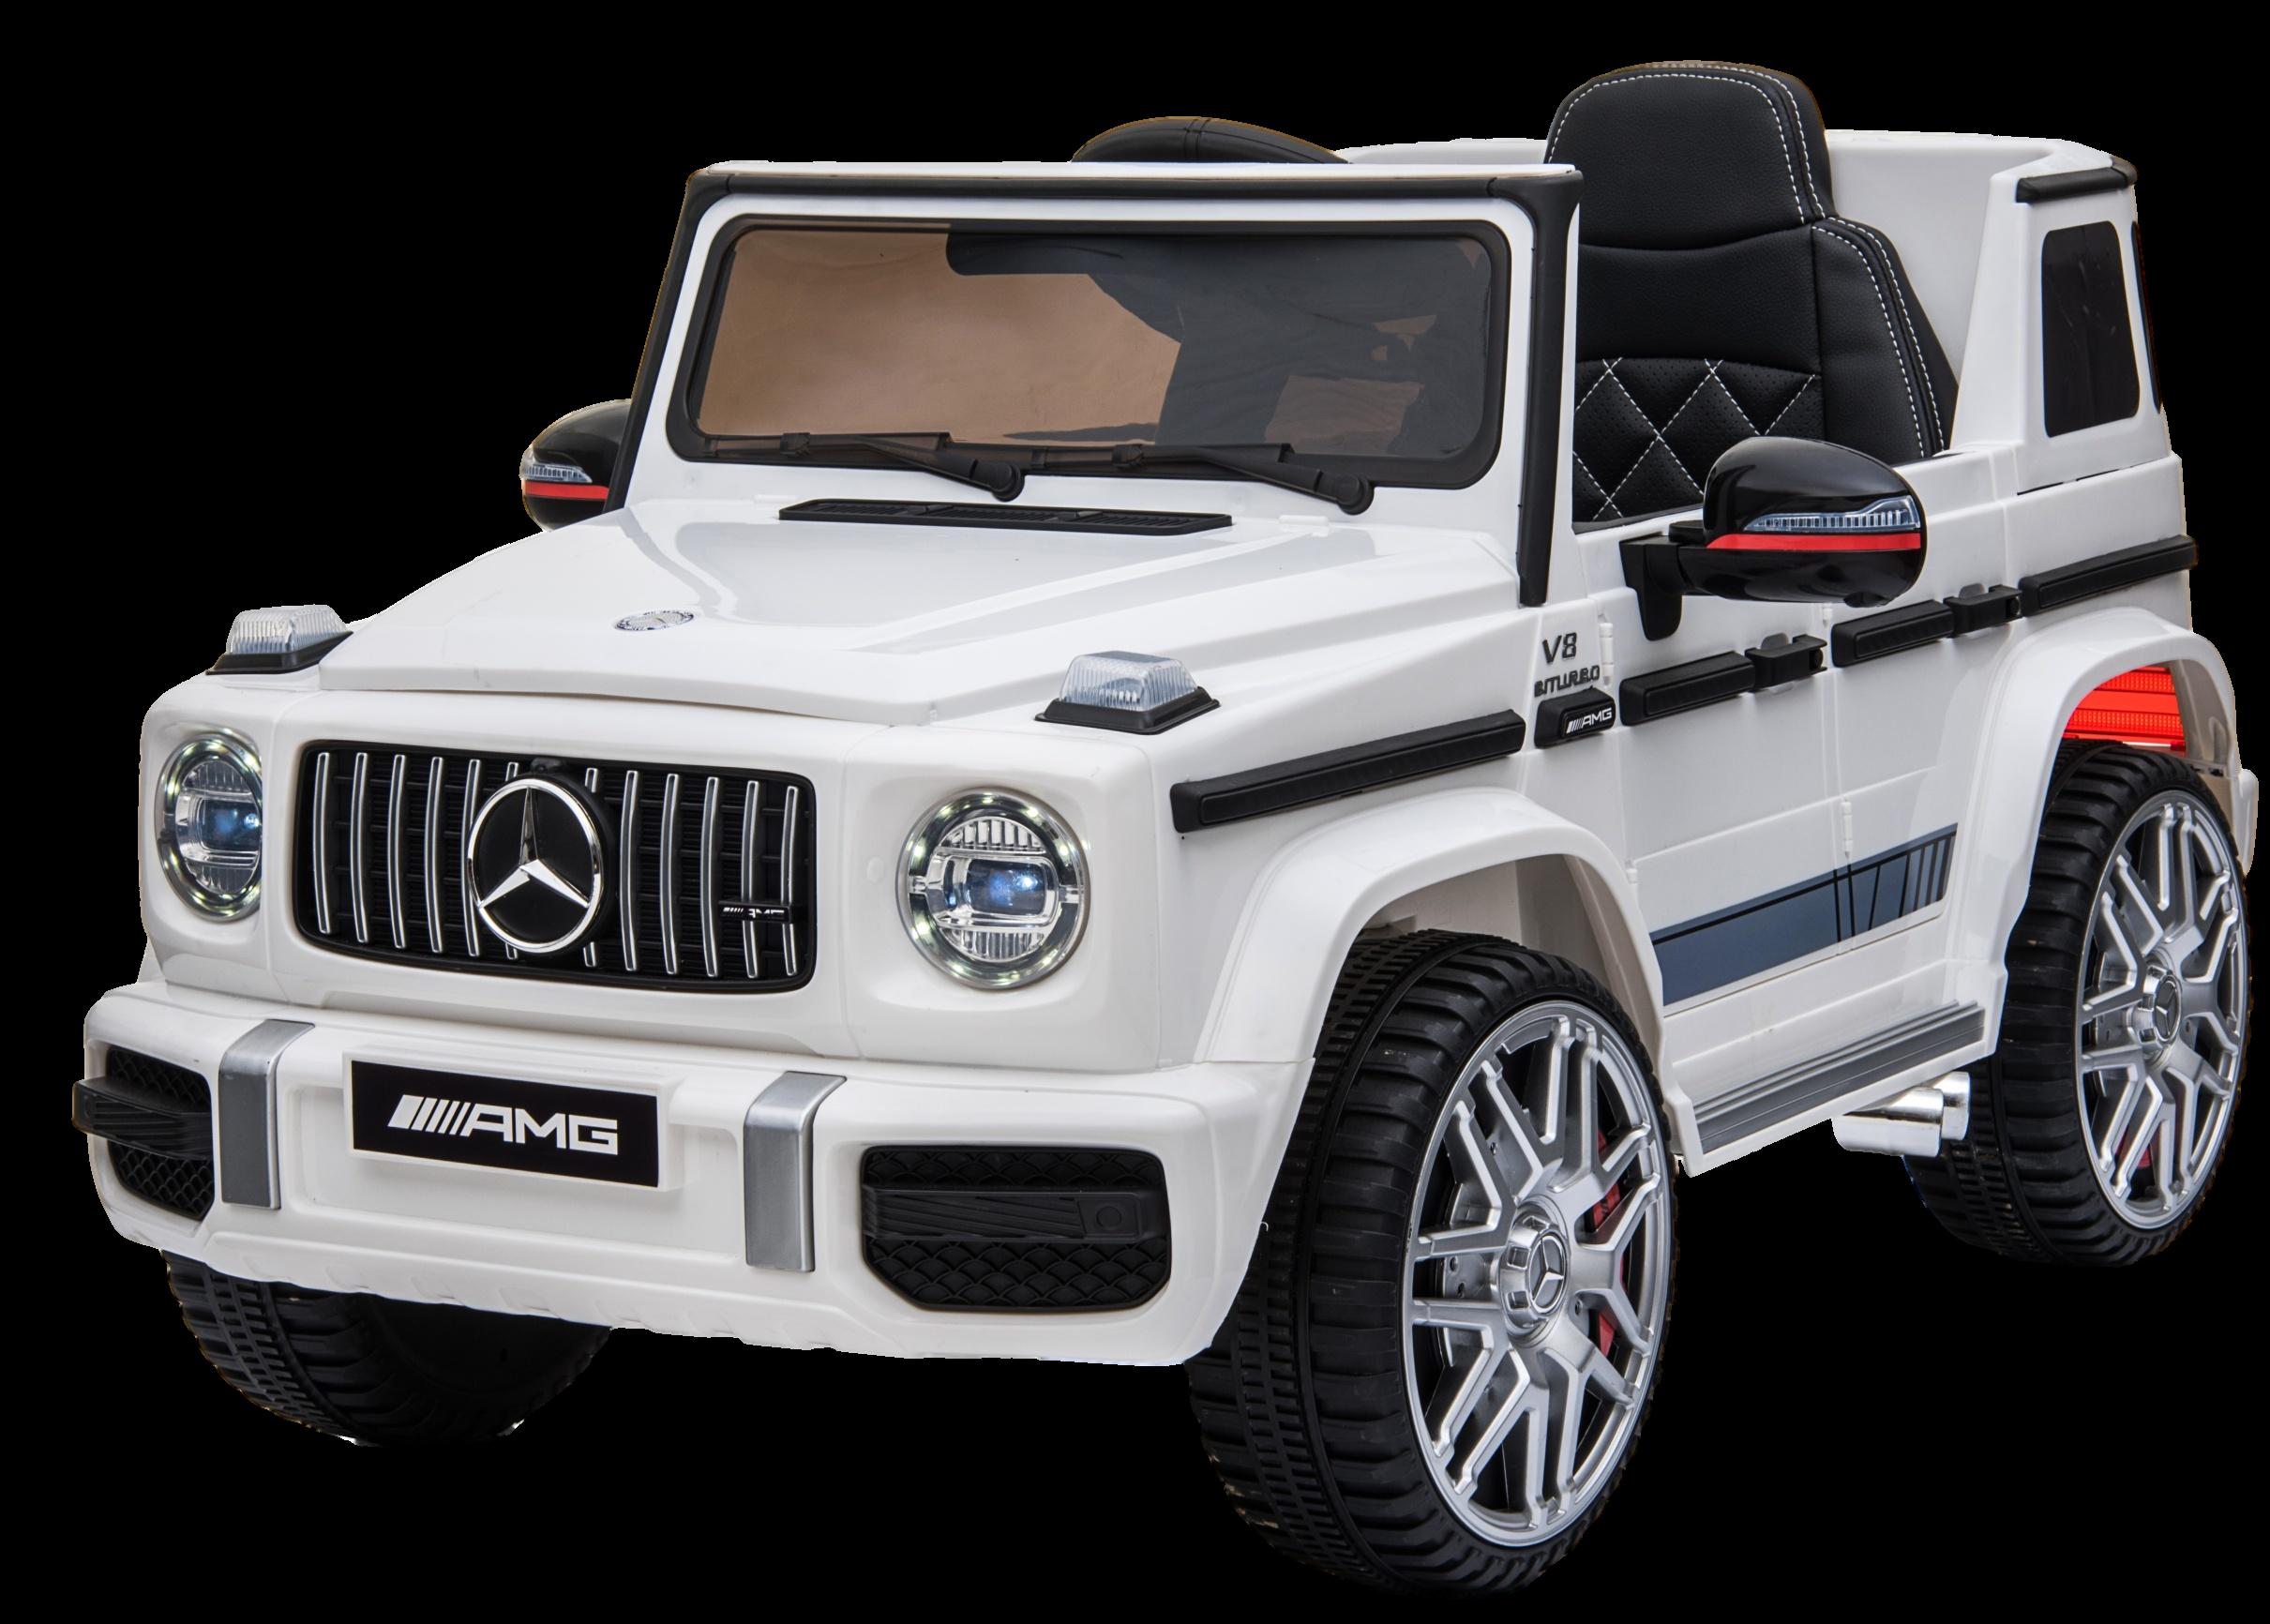 Купить Электромобиль Farfello Mercedes-AMG BBH-0003 G63 белый,